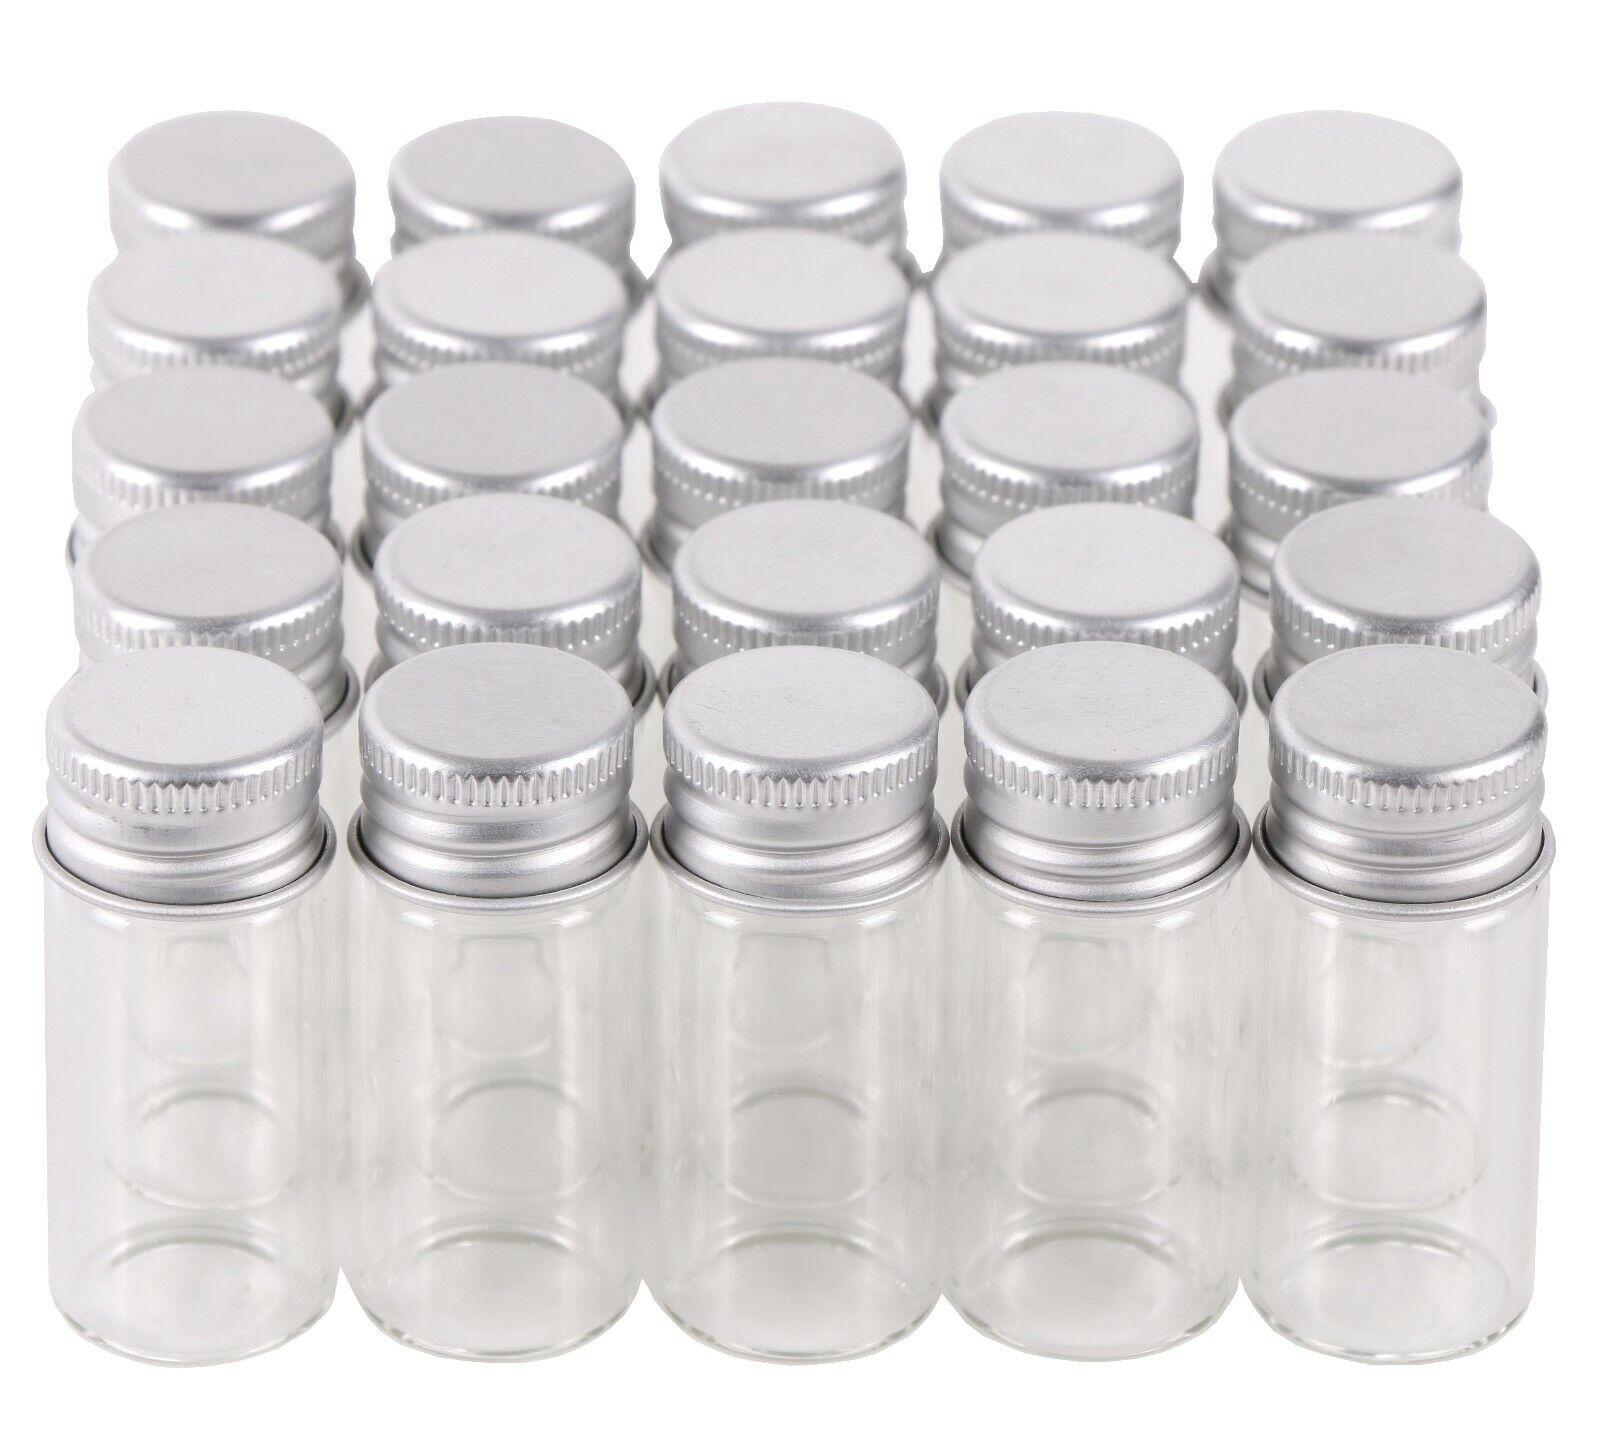 100X Tiny Vials 10ml Small Glass Bottles Mini Jars with Alum